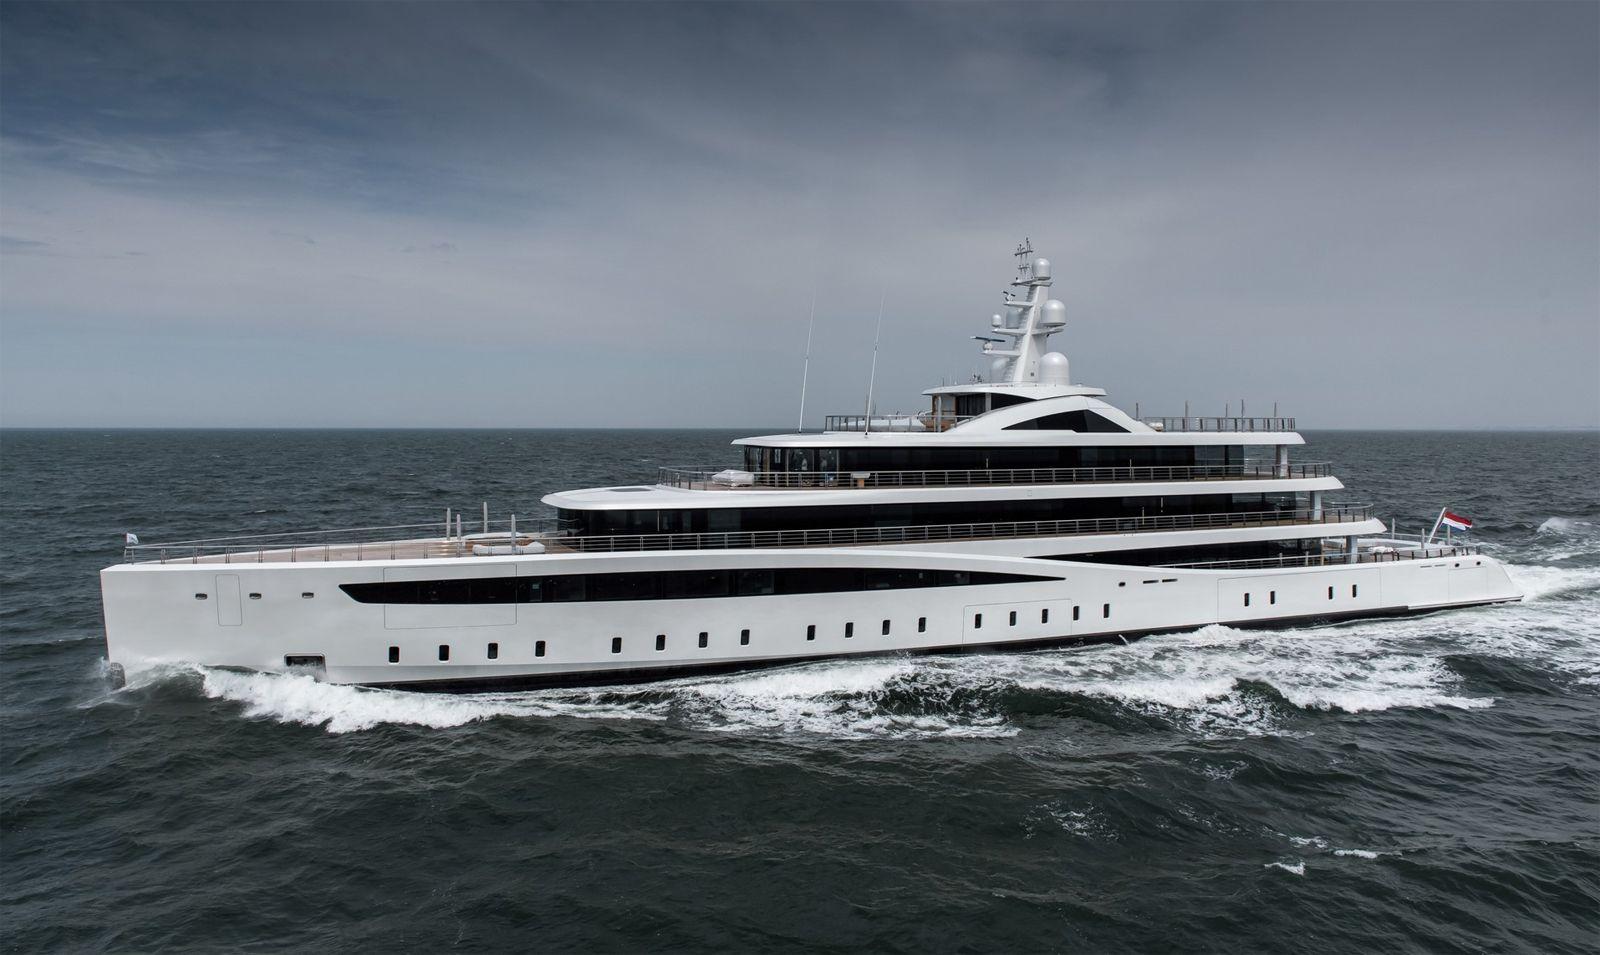 Viva -Eco-friendly 94-metre - from the Dutch shipyard Feadship